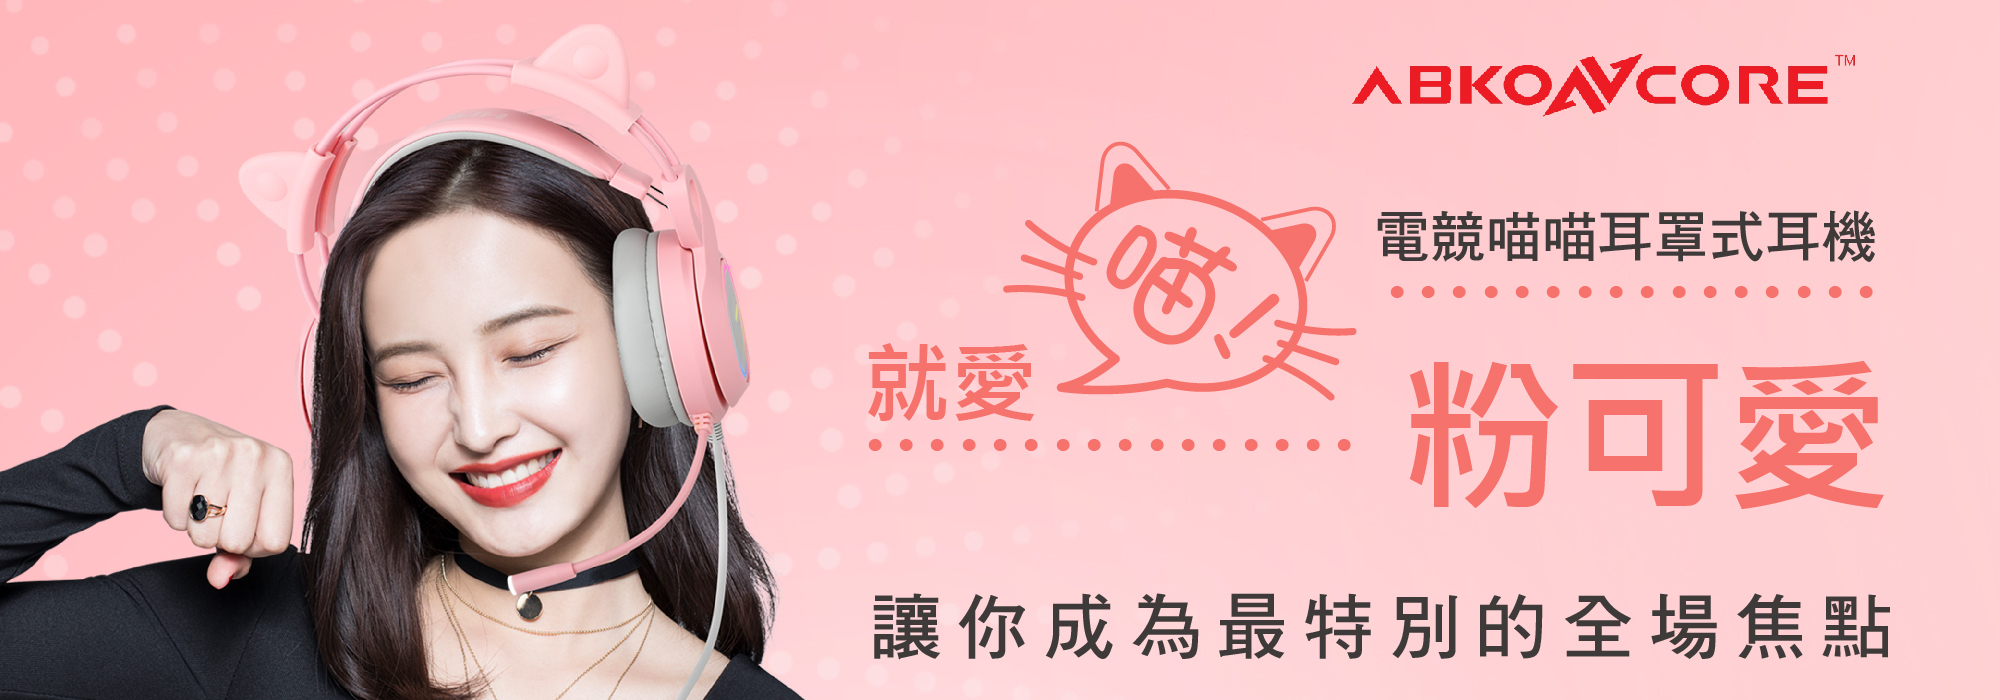 ABKONCORE,韓國耳機,貓耳耳機,電競耳機,粉紅耳機